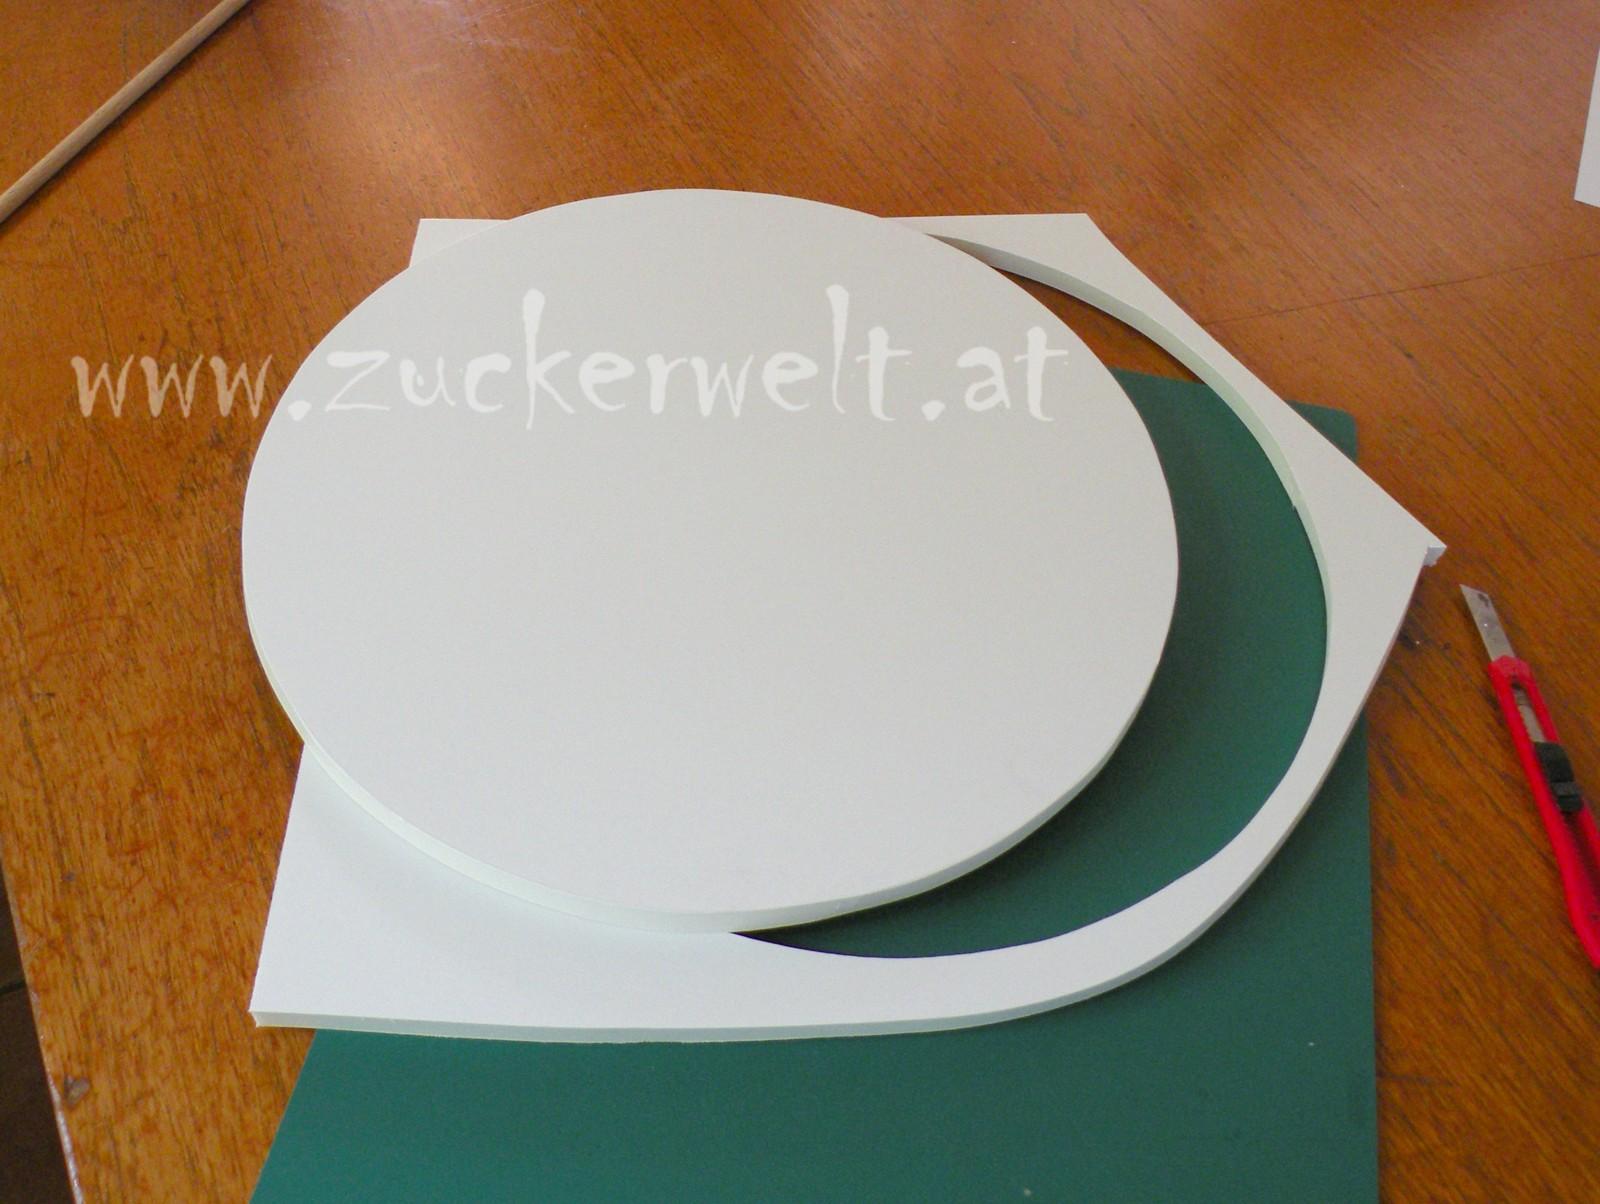 zuckerwelt cupcake turm. Black Bedroom Furniture Sets. Home Design Ideas